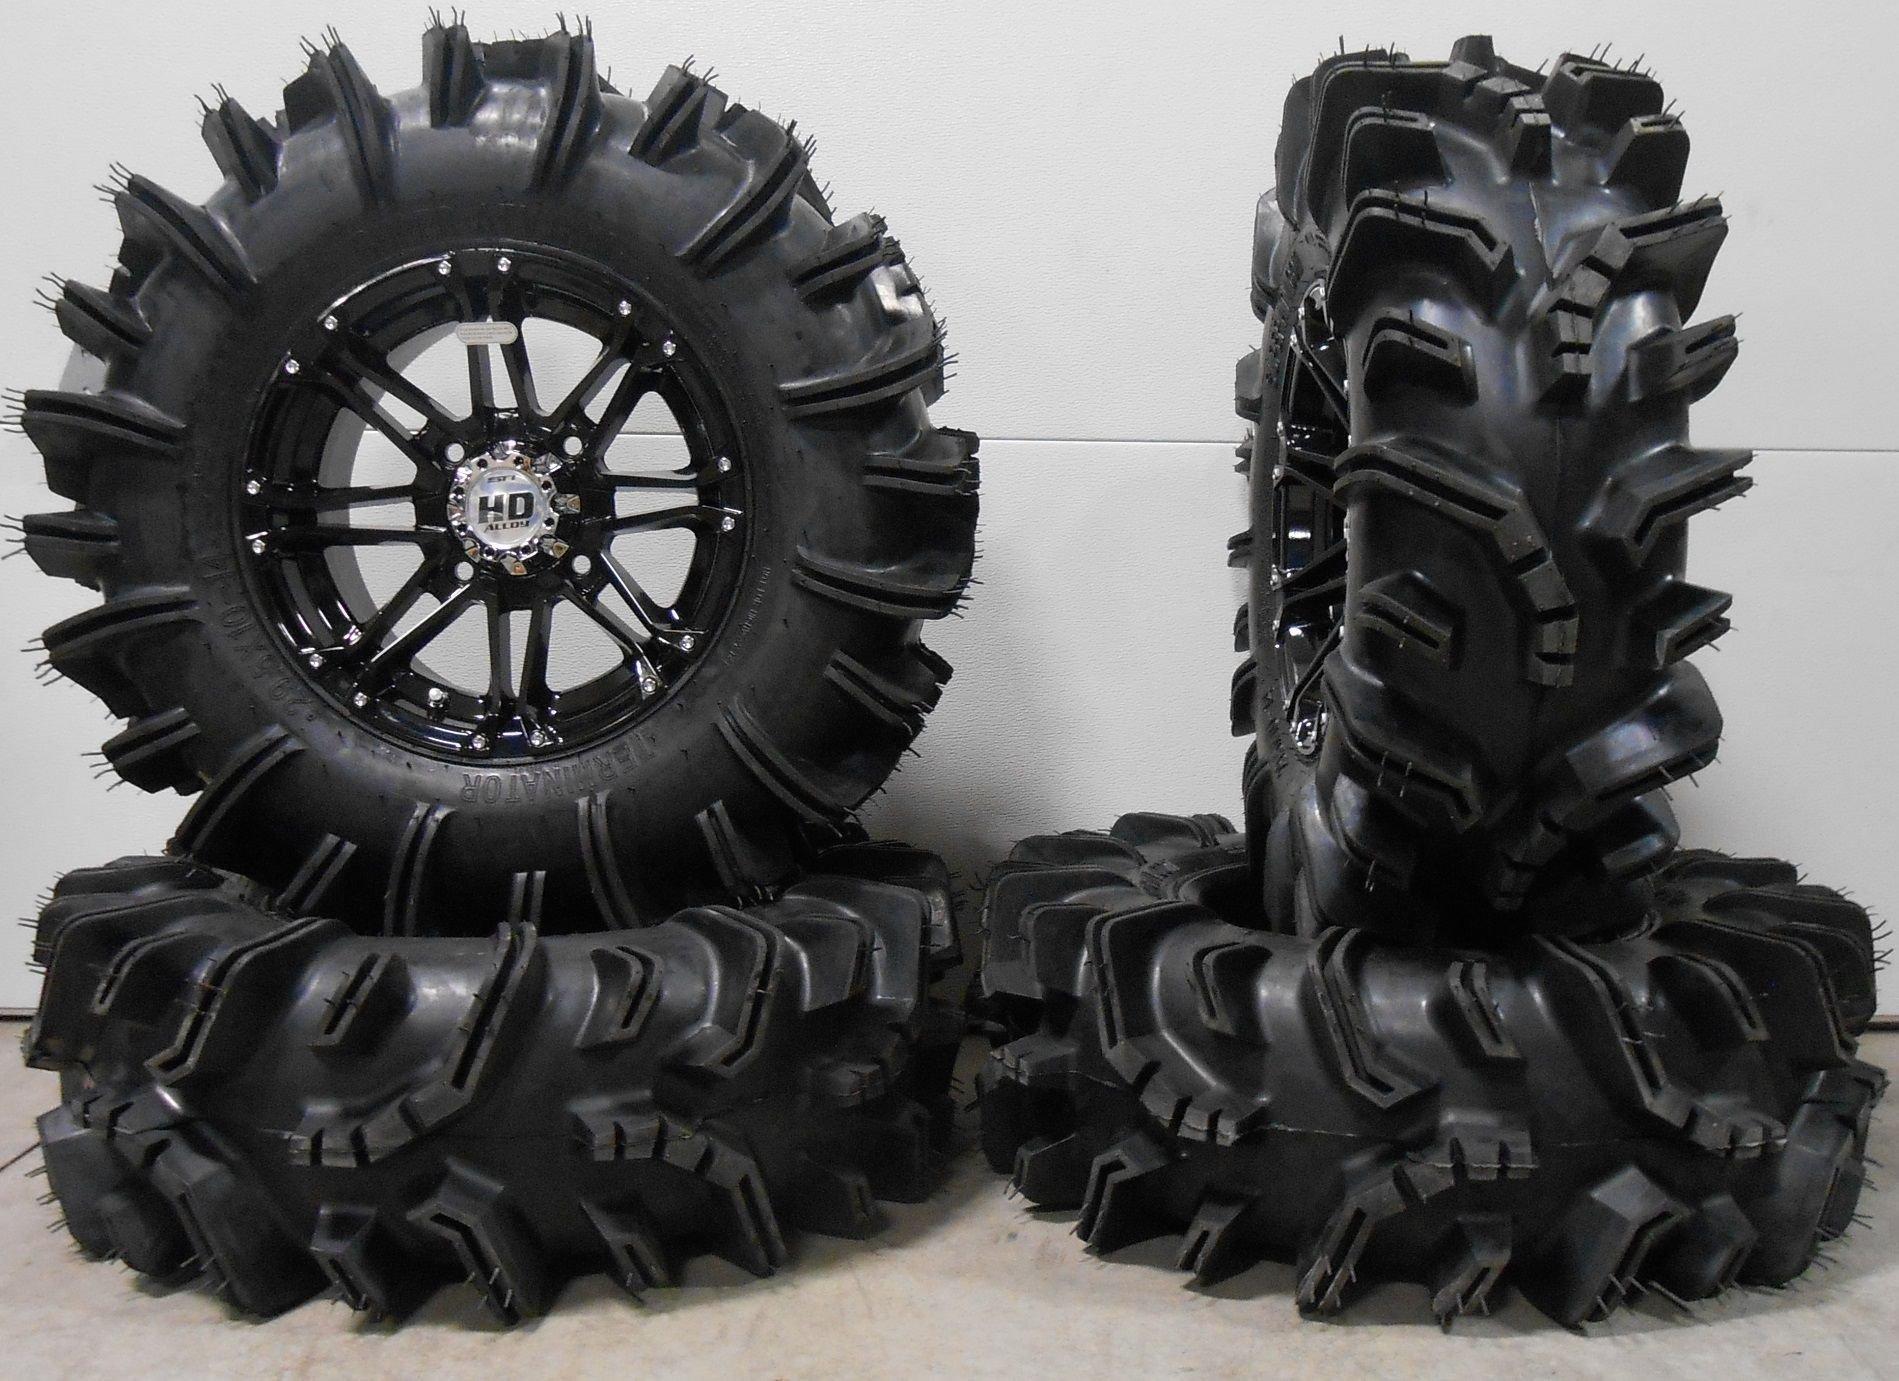 Bundle - 9 Items: STI HD3 14'' Wheels Black 29.5'' Terminator Tires [4x156 Bolt Pattern 3/8x24 Lug Kit] by Powersports Bundle (Image #4)